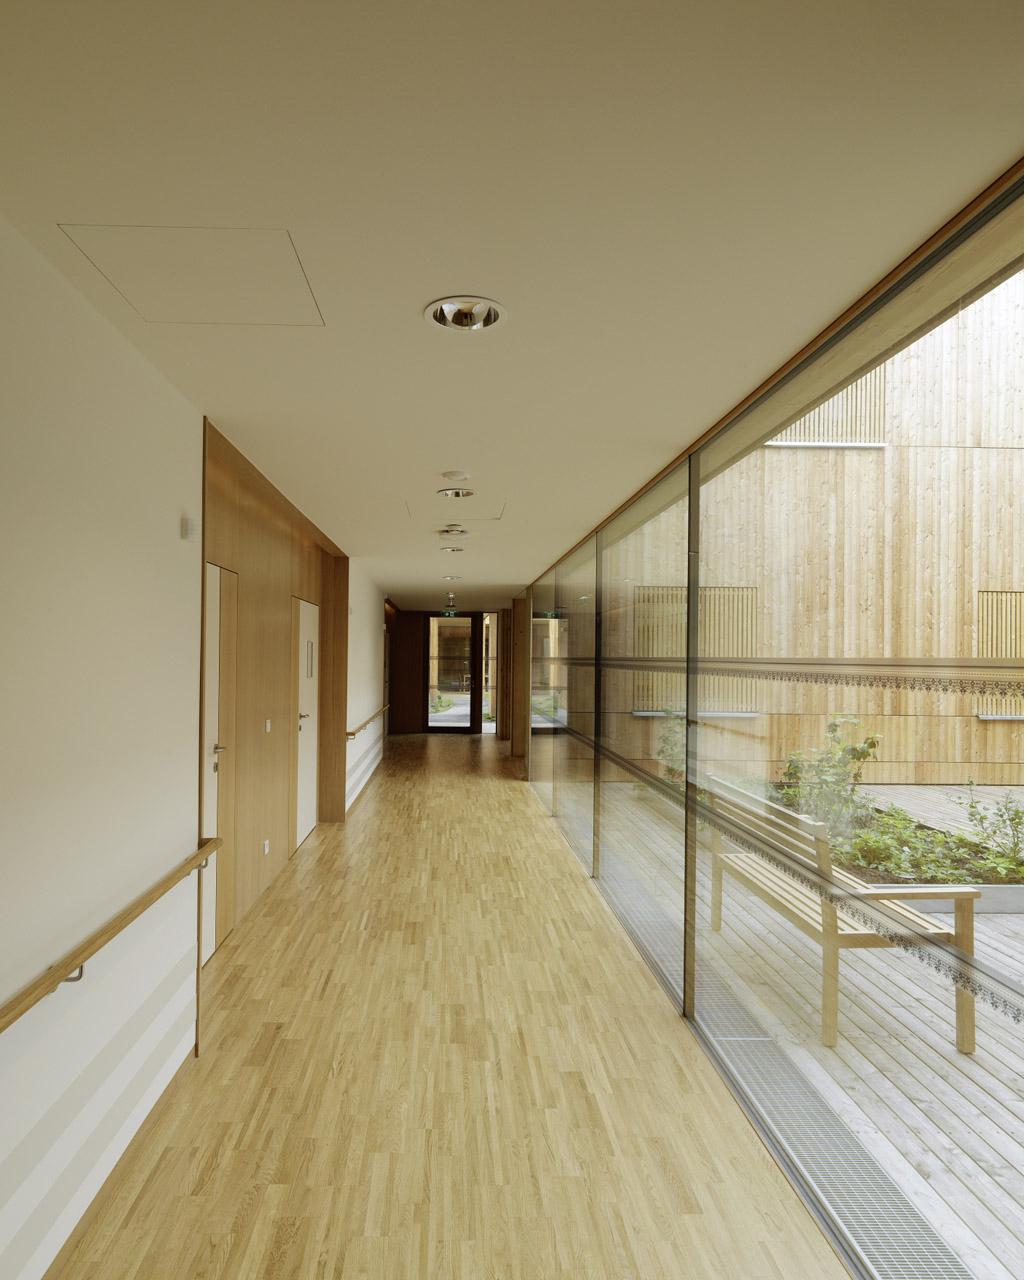 Home Design Ideas For The Elderly: Pflegeheim Erika Horn, Andritz « Dietger Wissounig